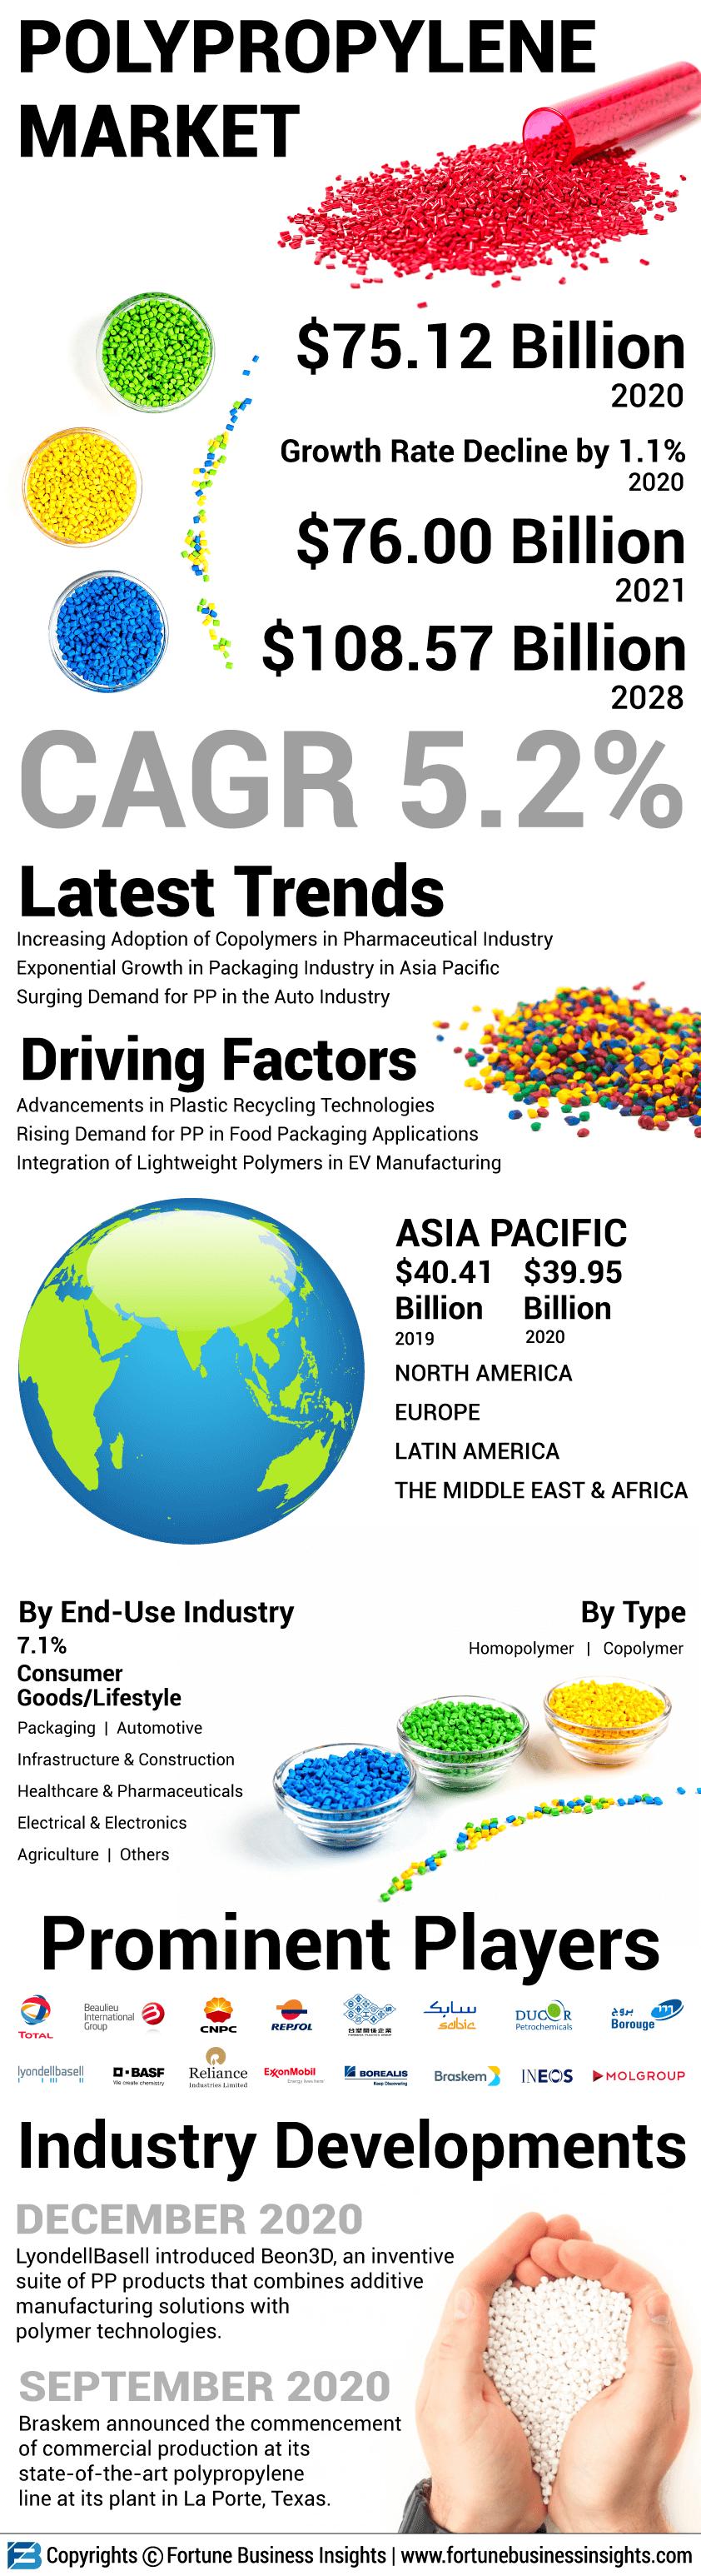 Polypropylene (PP) Market